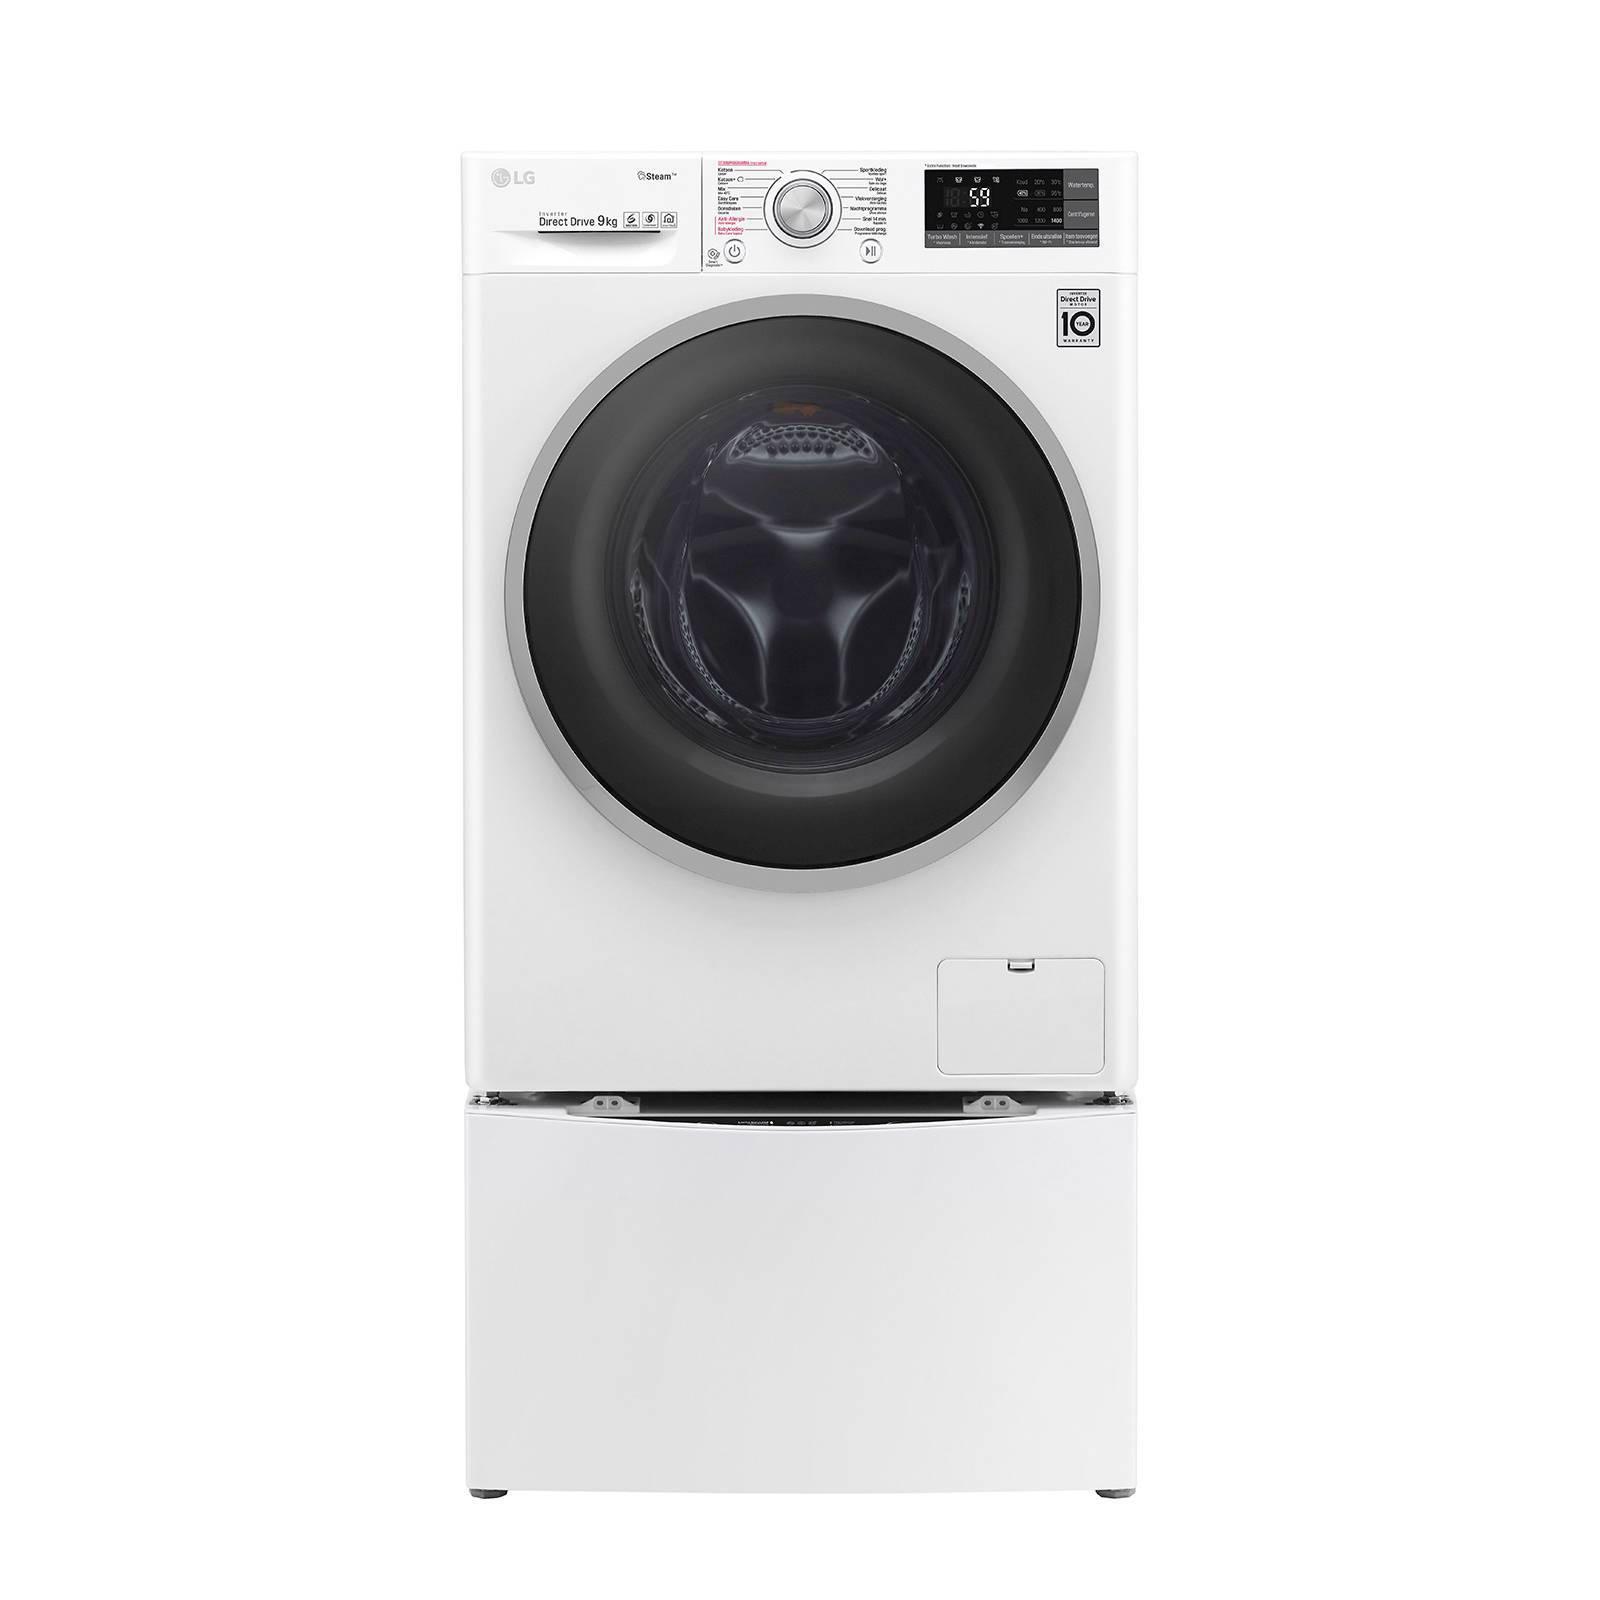 LG FH4J7VY1WD+FH8G1MINI TWINWash en Mini wasmachine   wehkamp 32277c05f3de